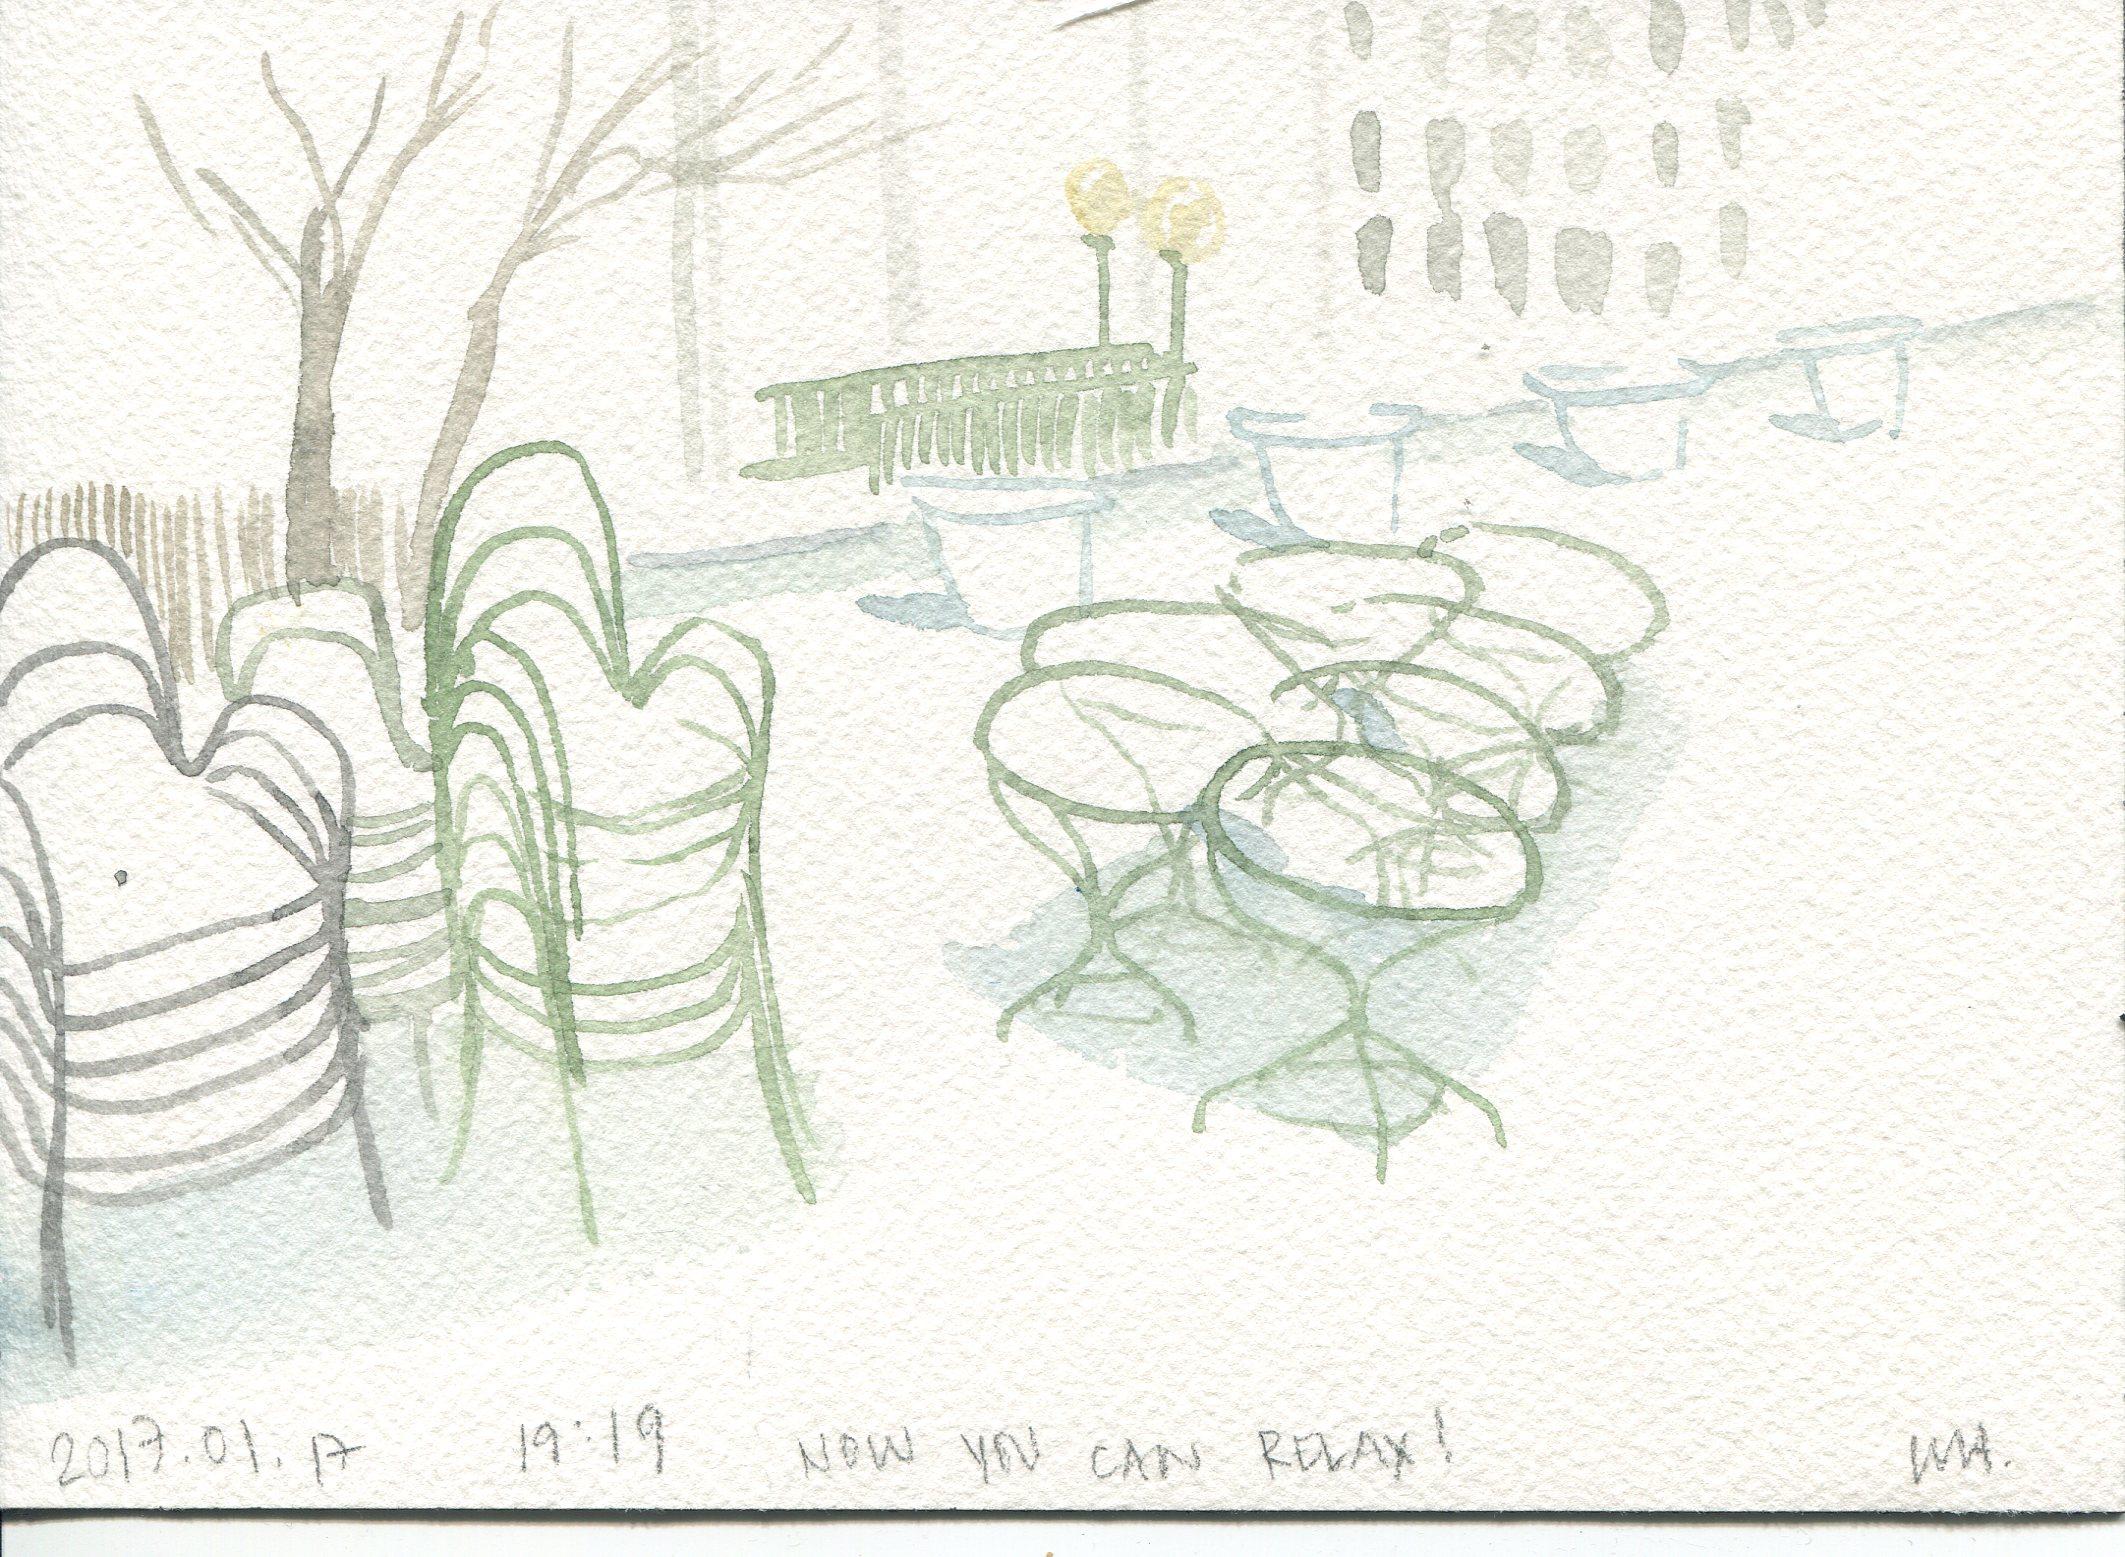 2017-01-22 drawing002.jpg